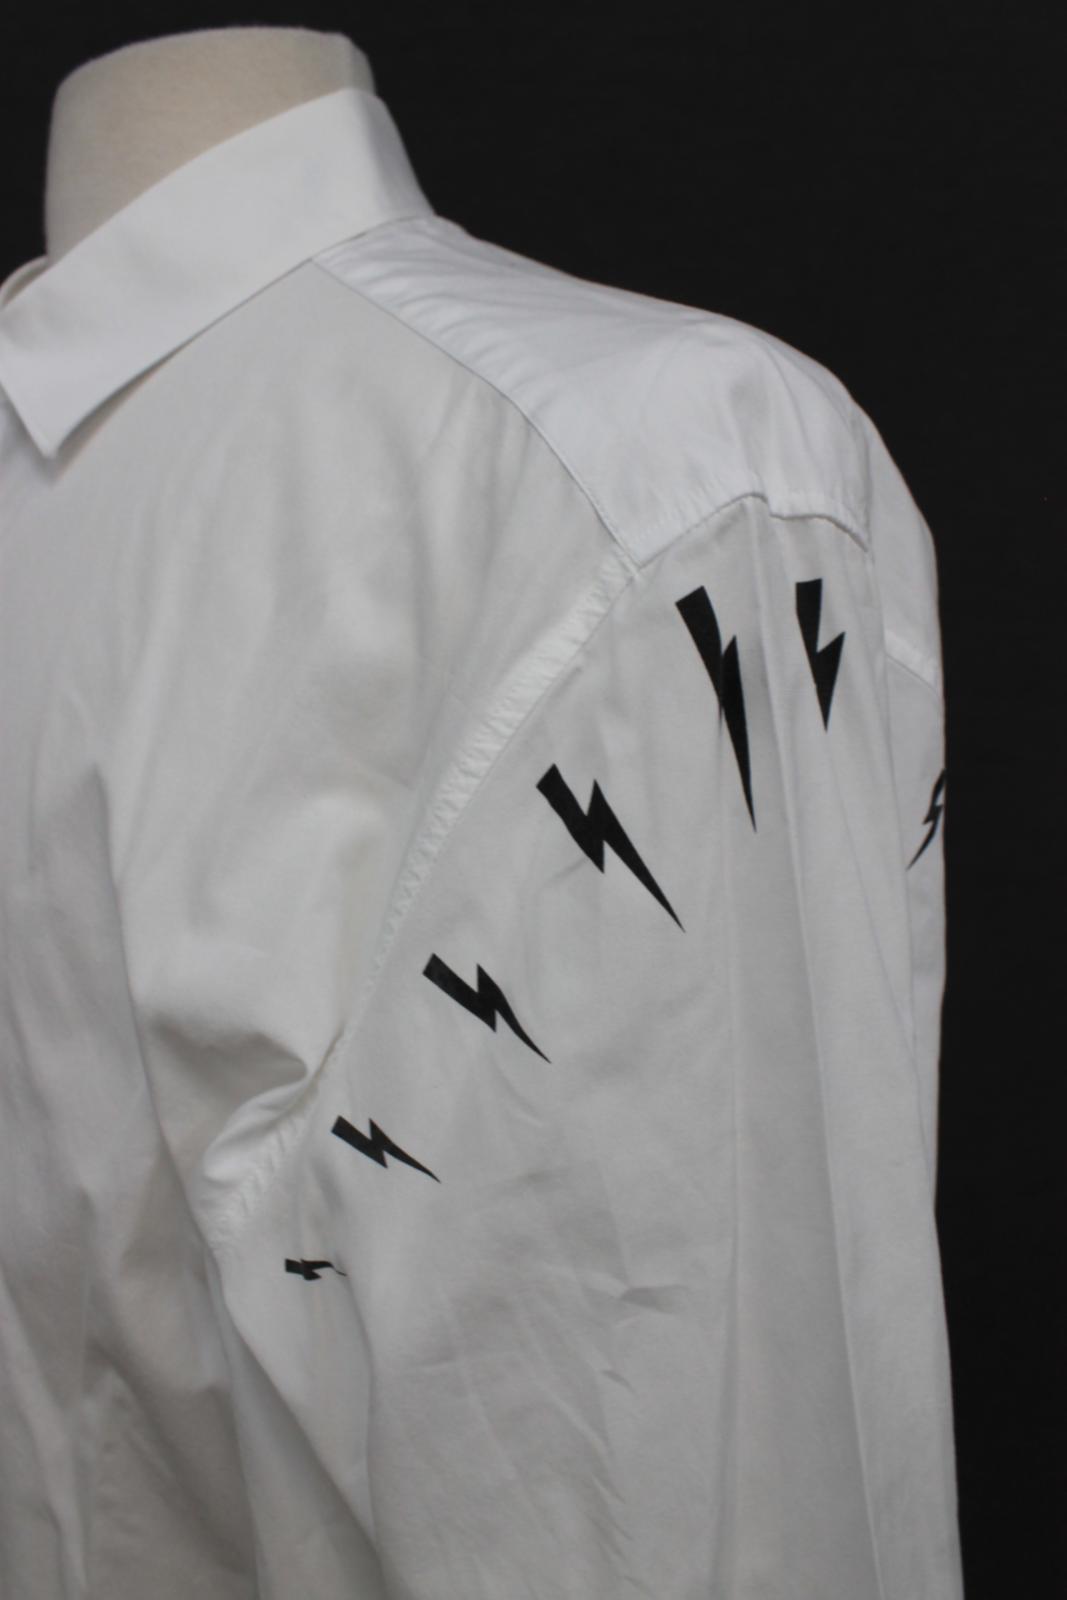 Neil-barrett-hombre-blanco-de-algodon-manga-de-Rayo-con-cuello-camisa-tamano-17-5-034 miniatura 7